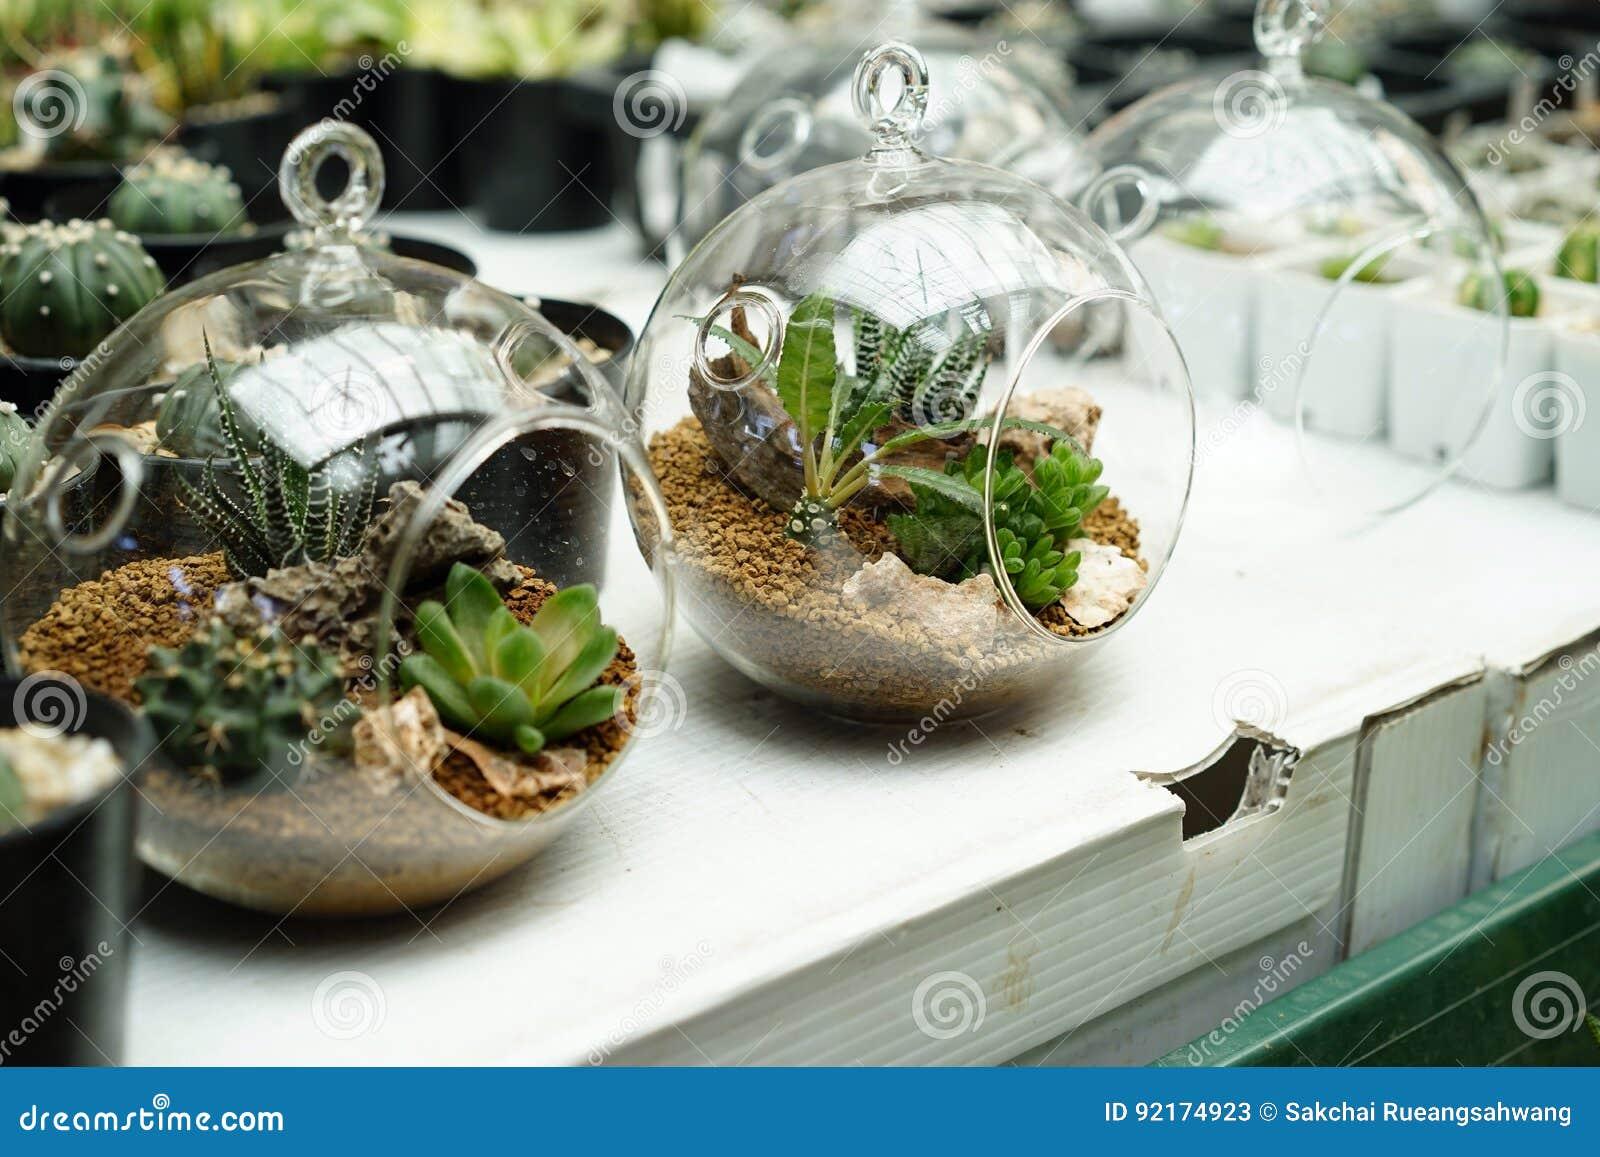 Terrarium Plants Stock Image Image Of Cane Cacti Environment